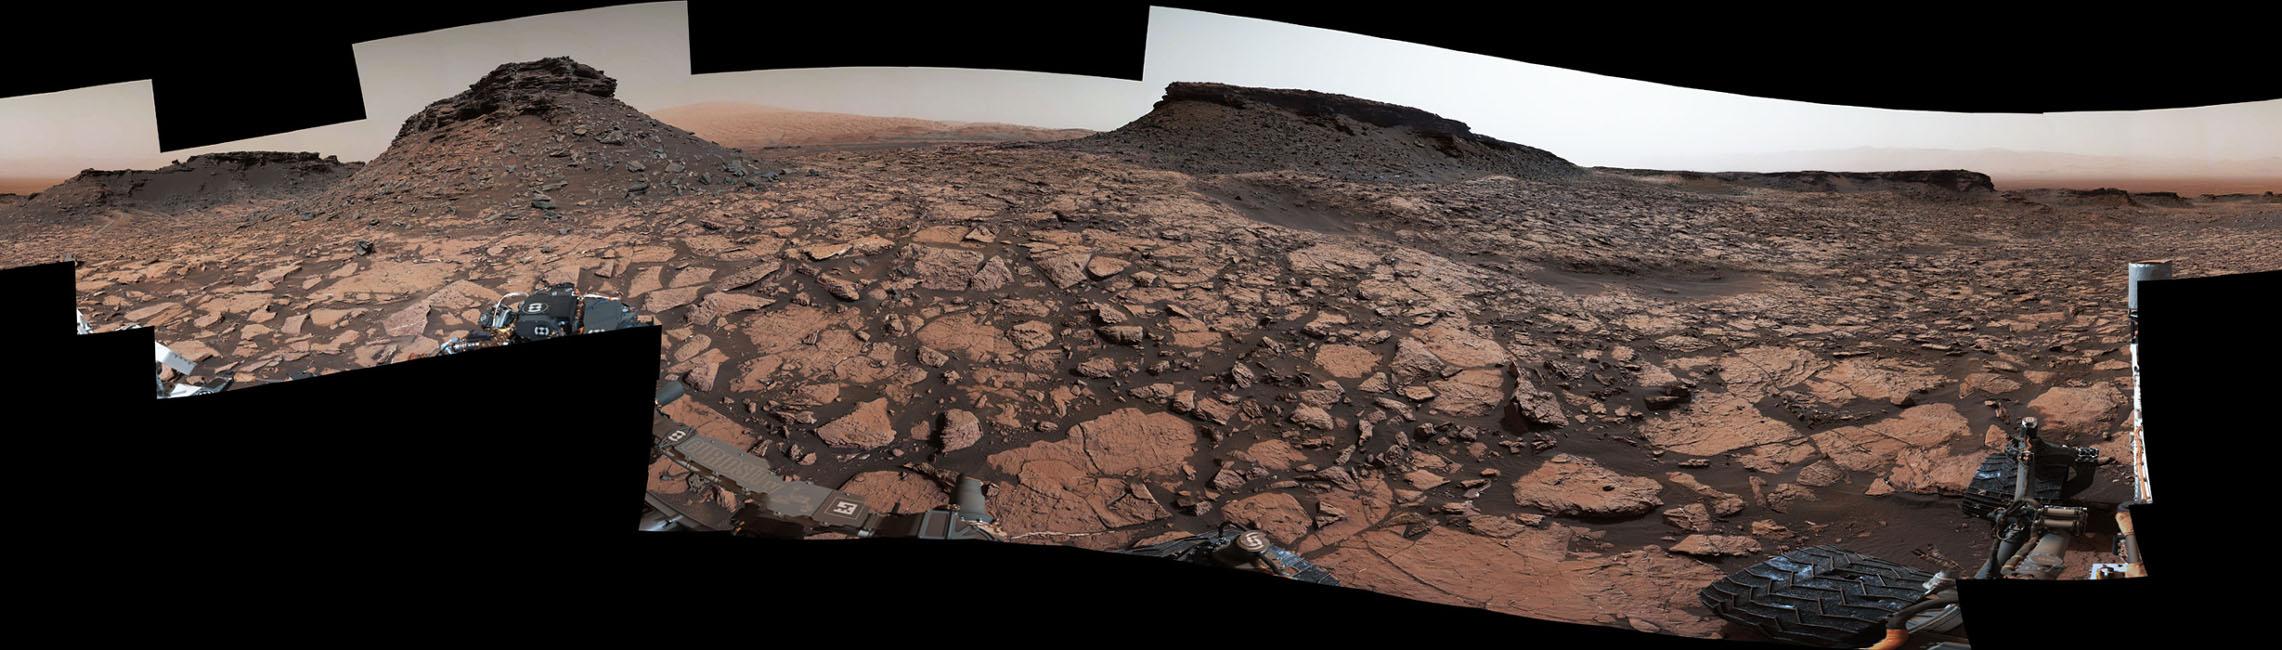 mars surface curiosity panorama - photo #40